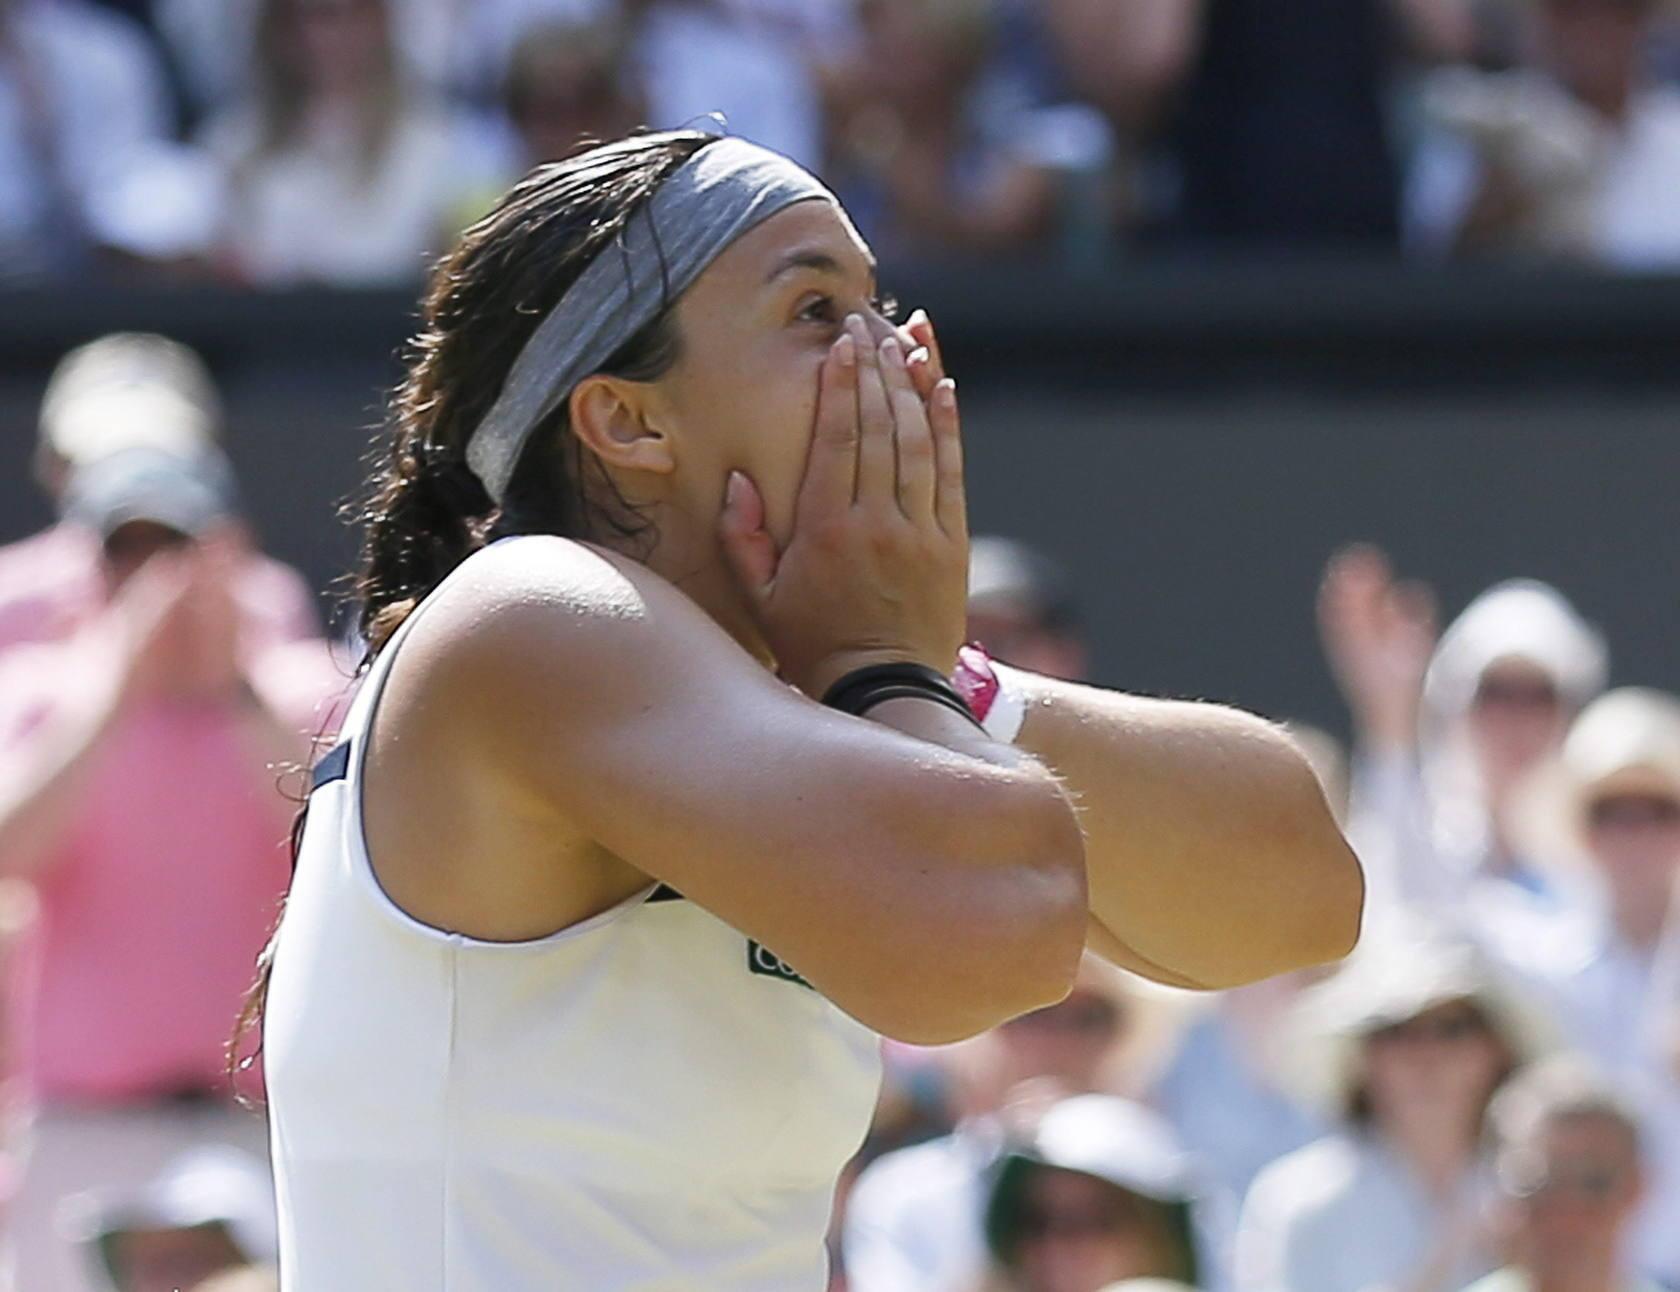 La francesa Marion Bartoli gana Wimbledon